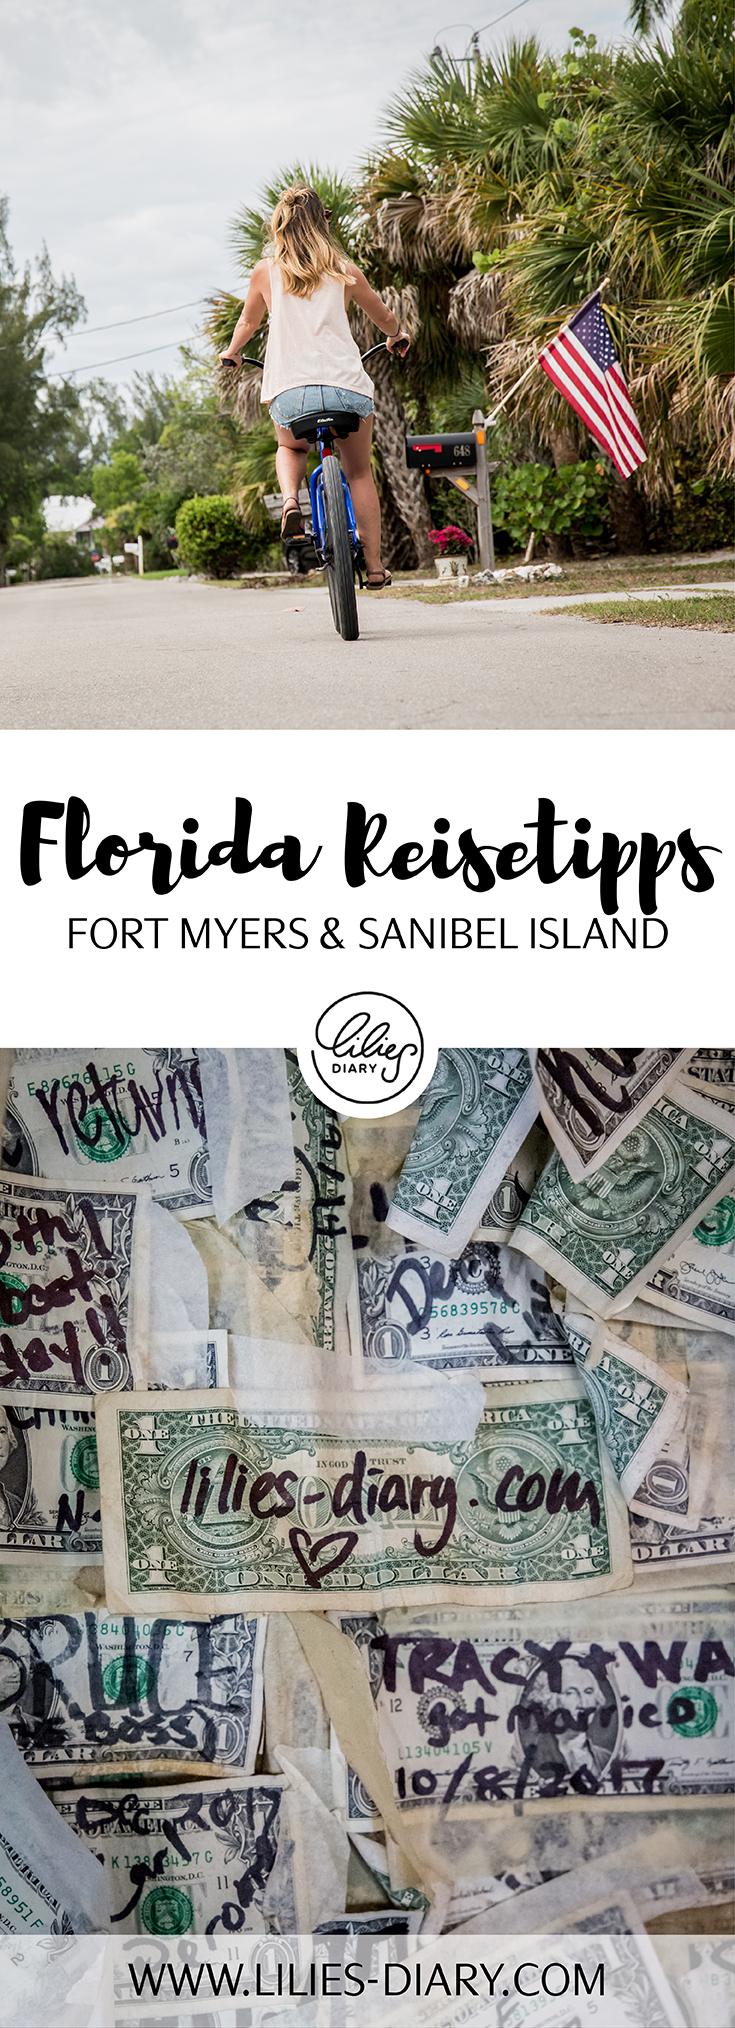 Tipps fuer Florida